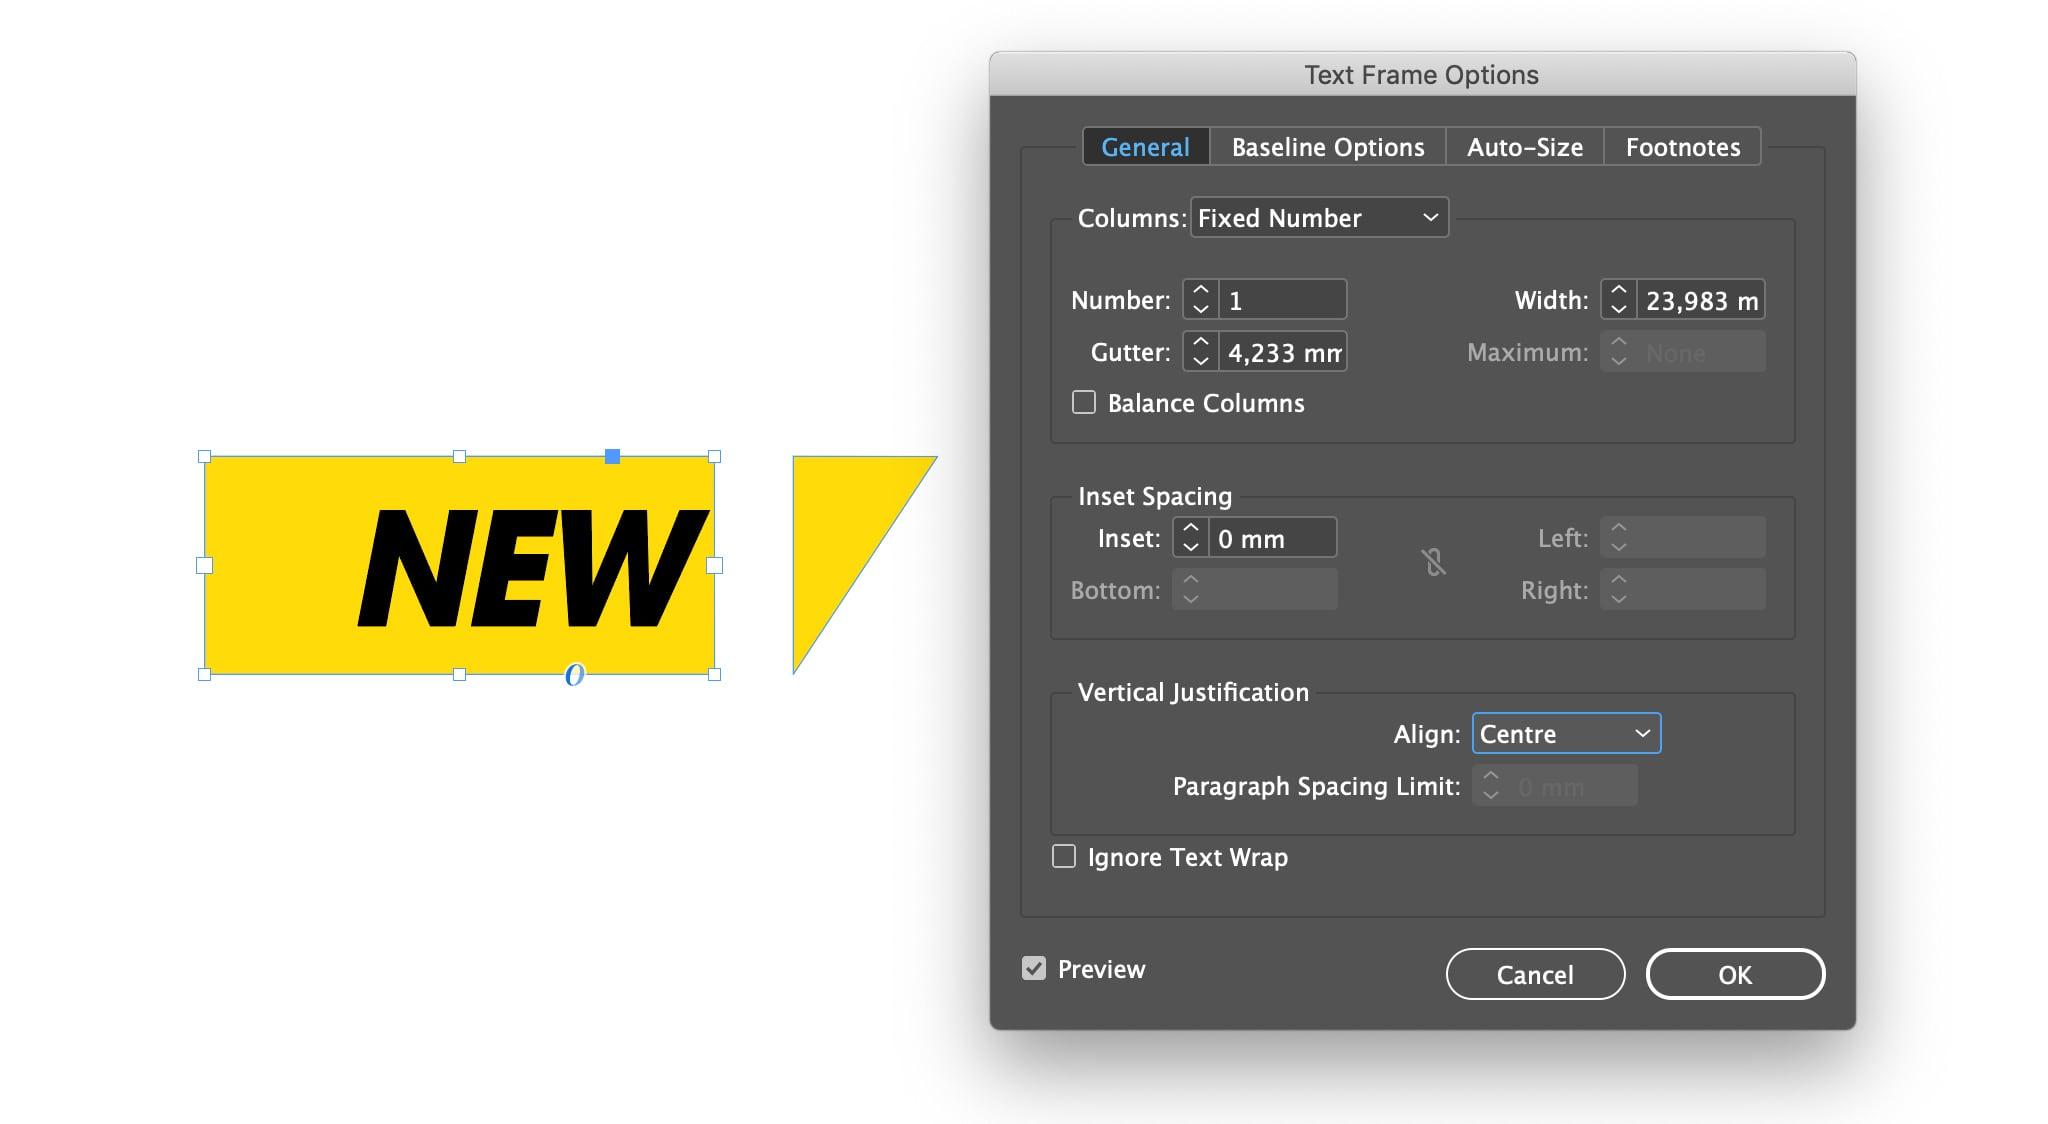 Transform the rectangle to a text-box.